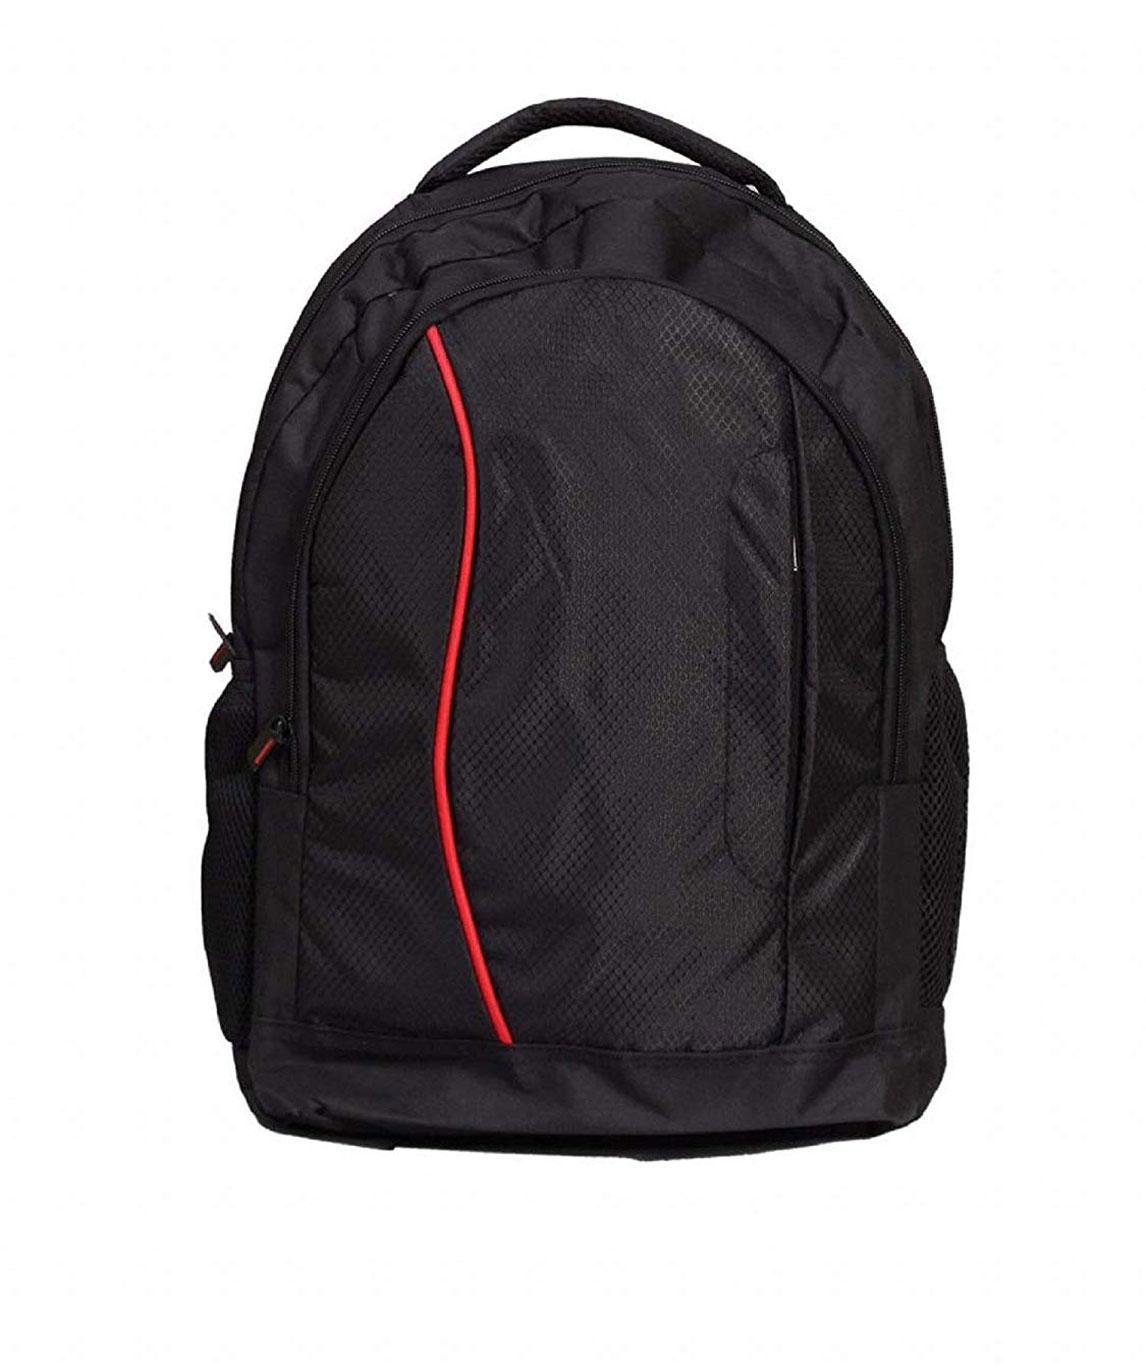 Faisal Raza Expandable Laptop Backpack (Red::Black)